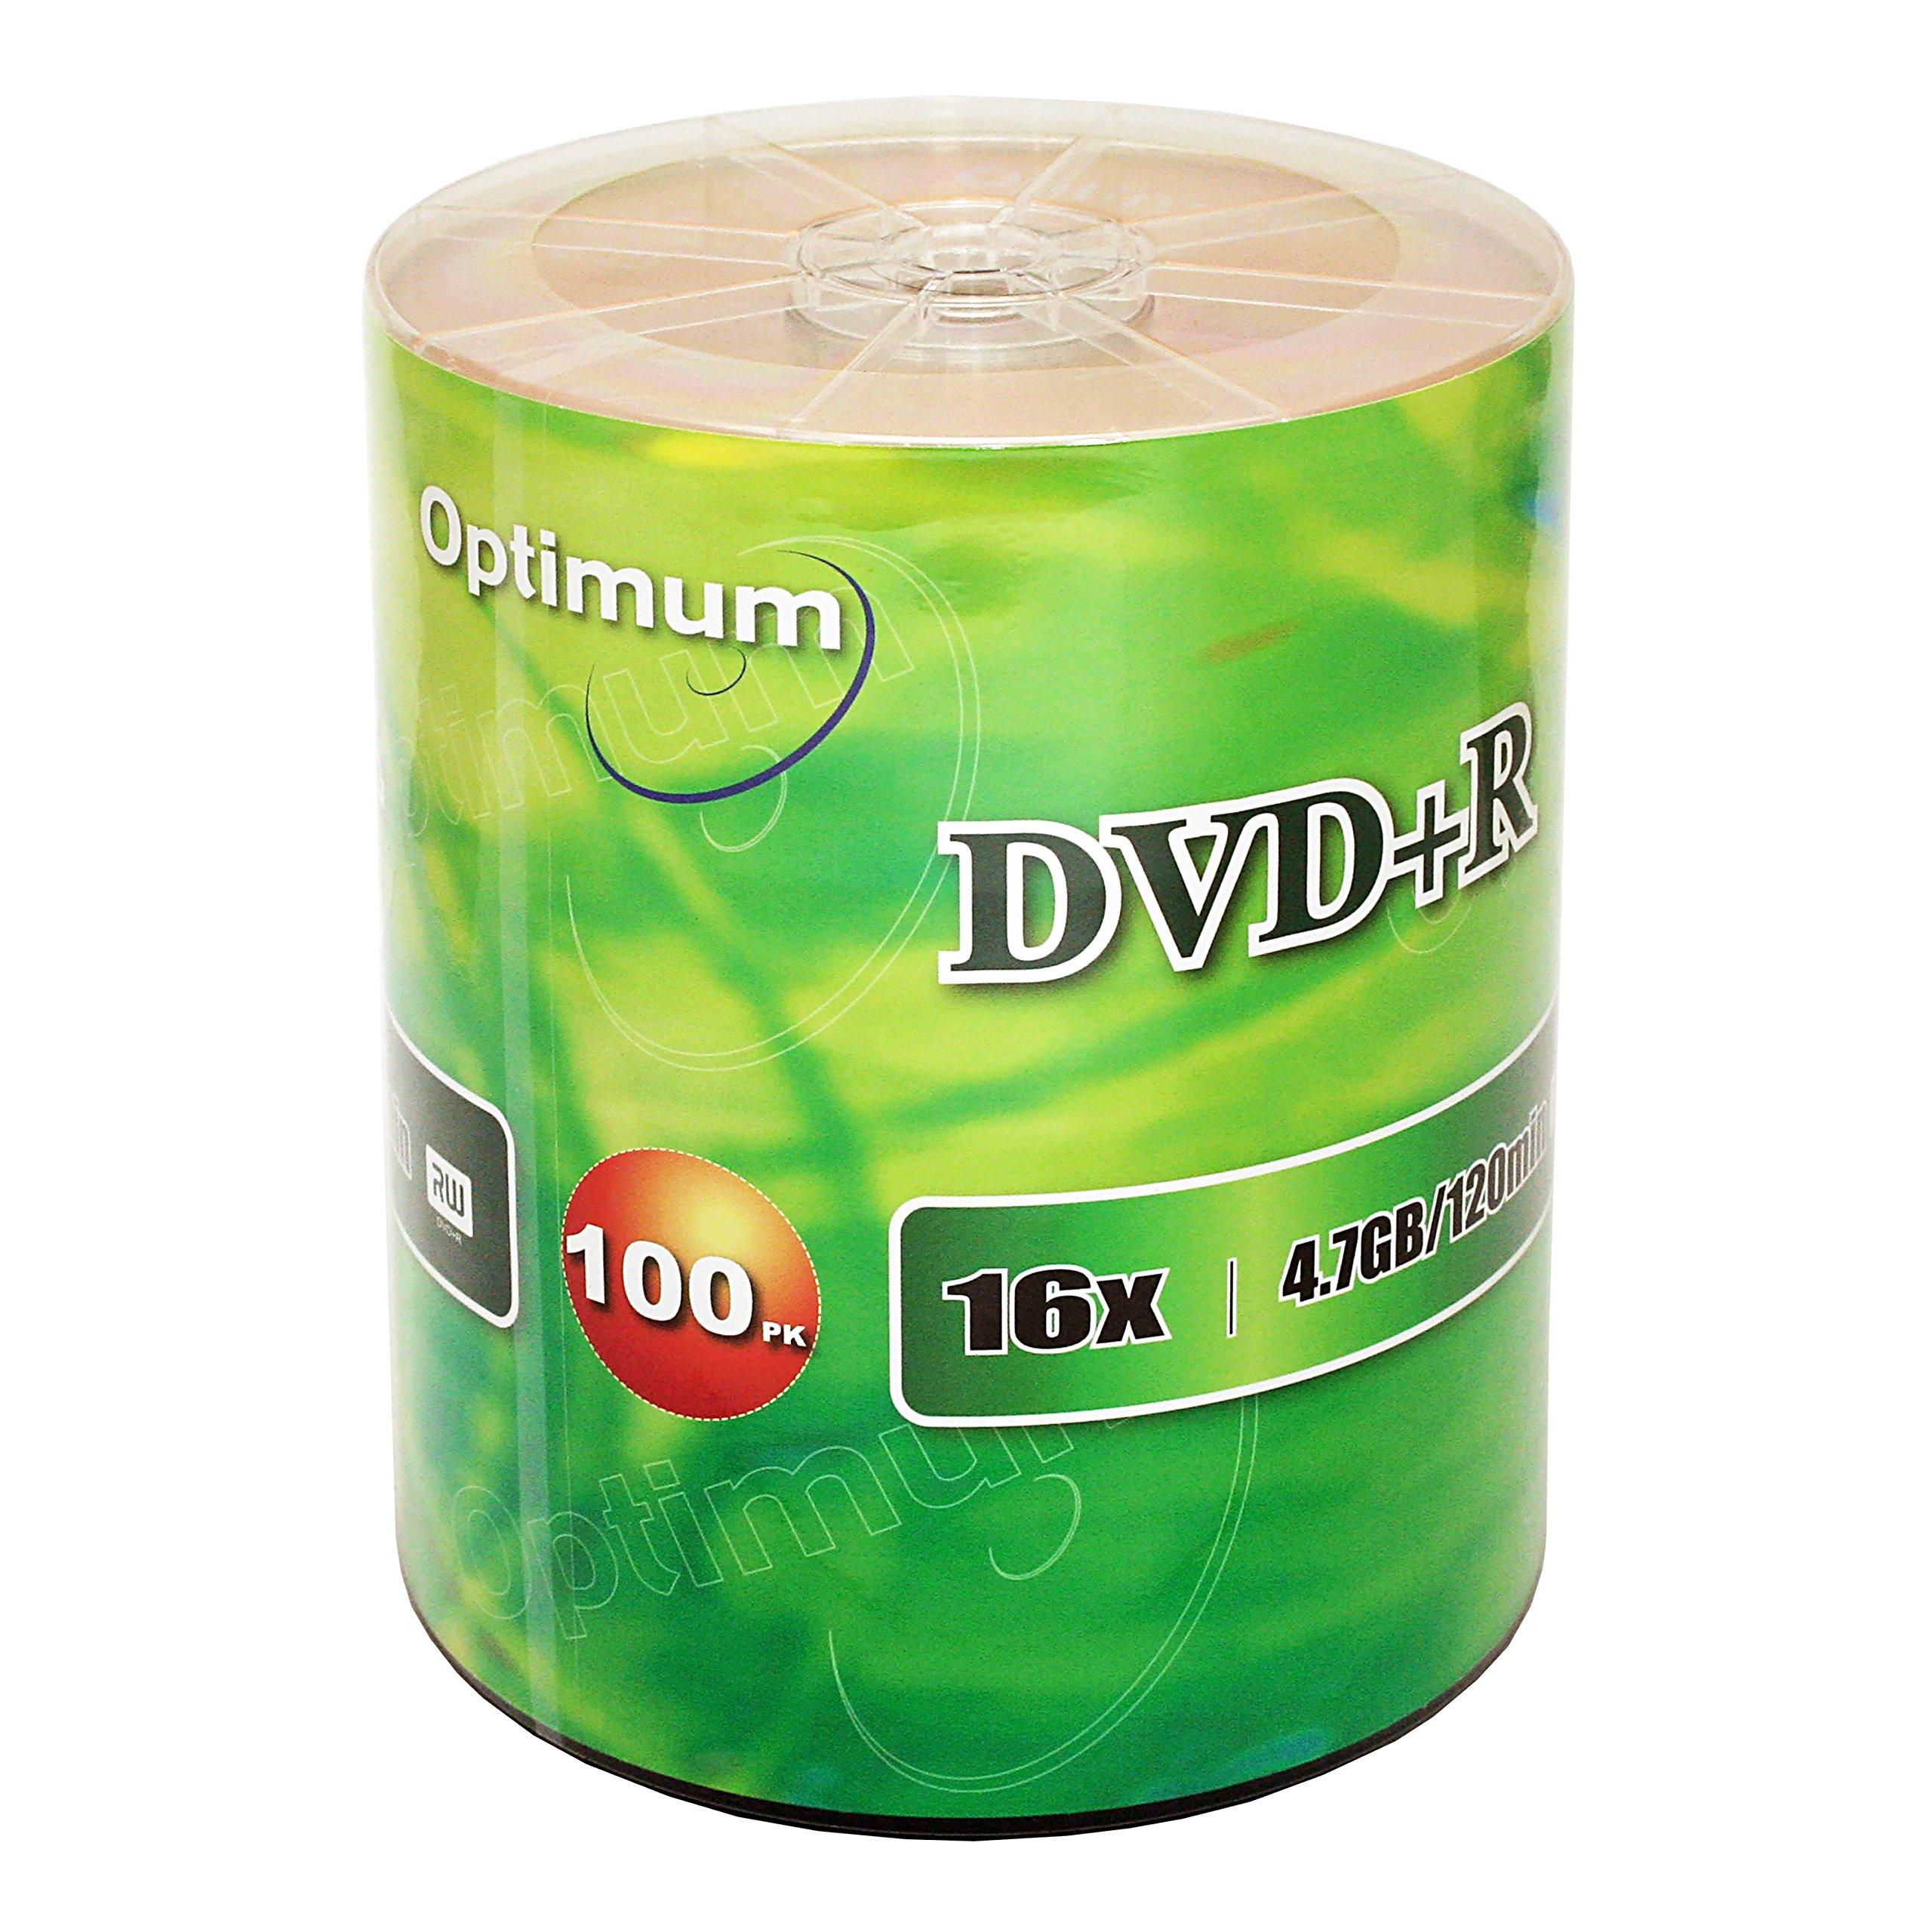 Optimum DVD+R 16x 4.7GB / 120min 100pk by Optimum